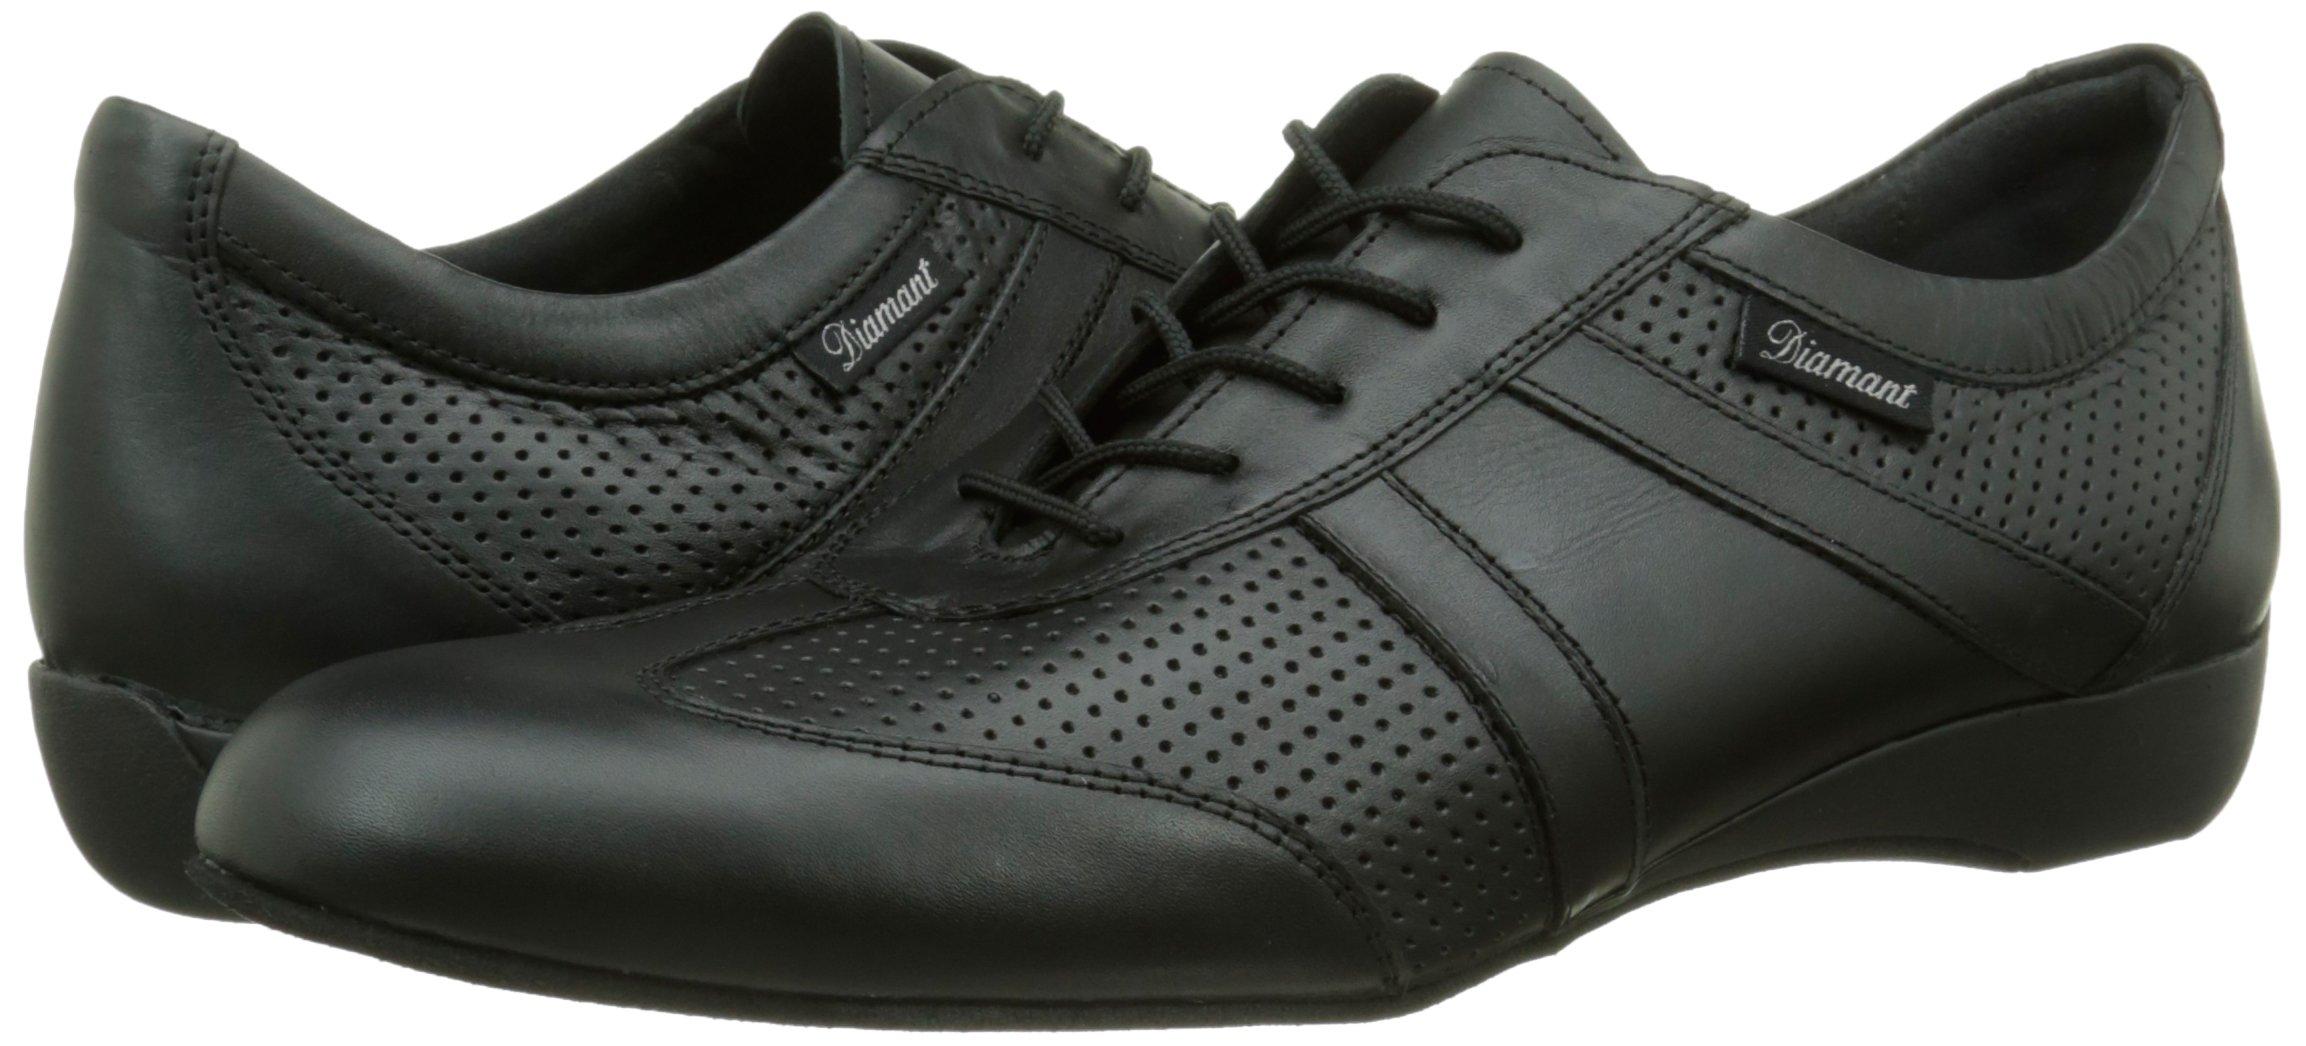 Diamant Men's Model 13 Dance Sneaker- 1'' (2.5 cm) Wedge Heel (Wide - H Width), 13.5 W US (13 UK) by Diamant (Image #5)